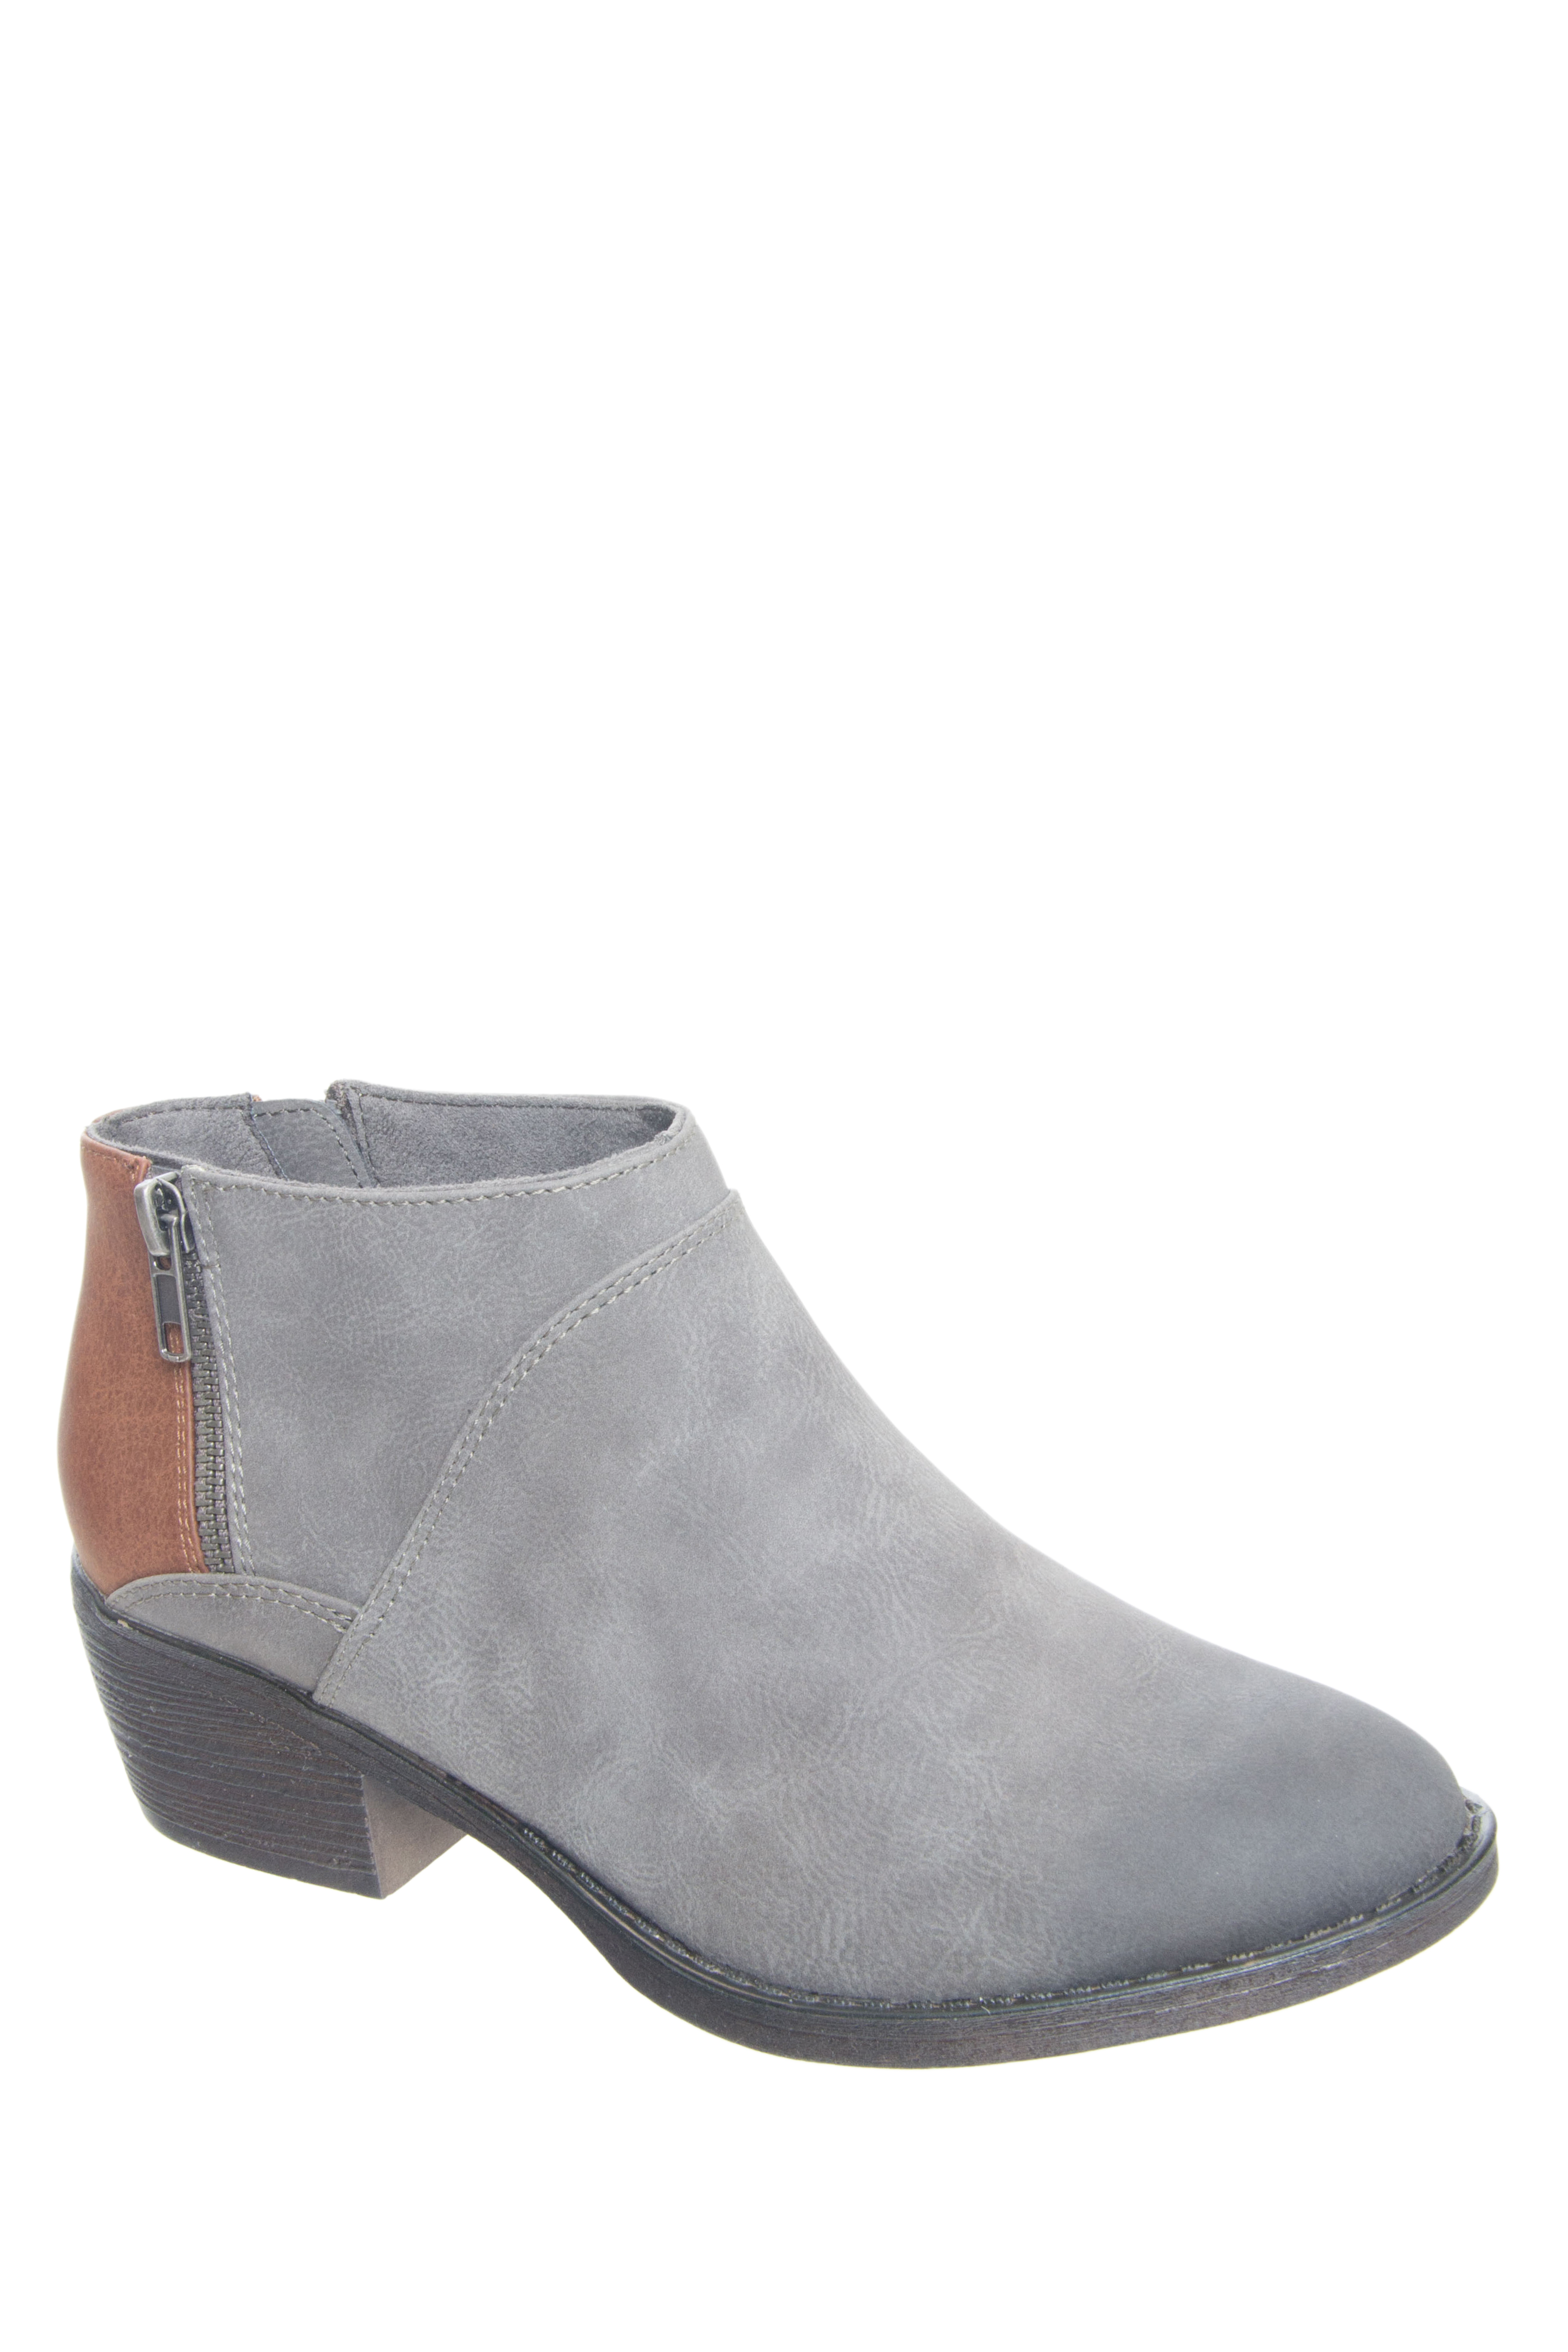 BC Footwear Union Mid Heel Booties - Grey / Whiskey